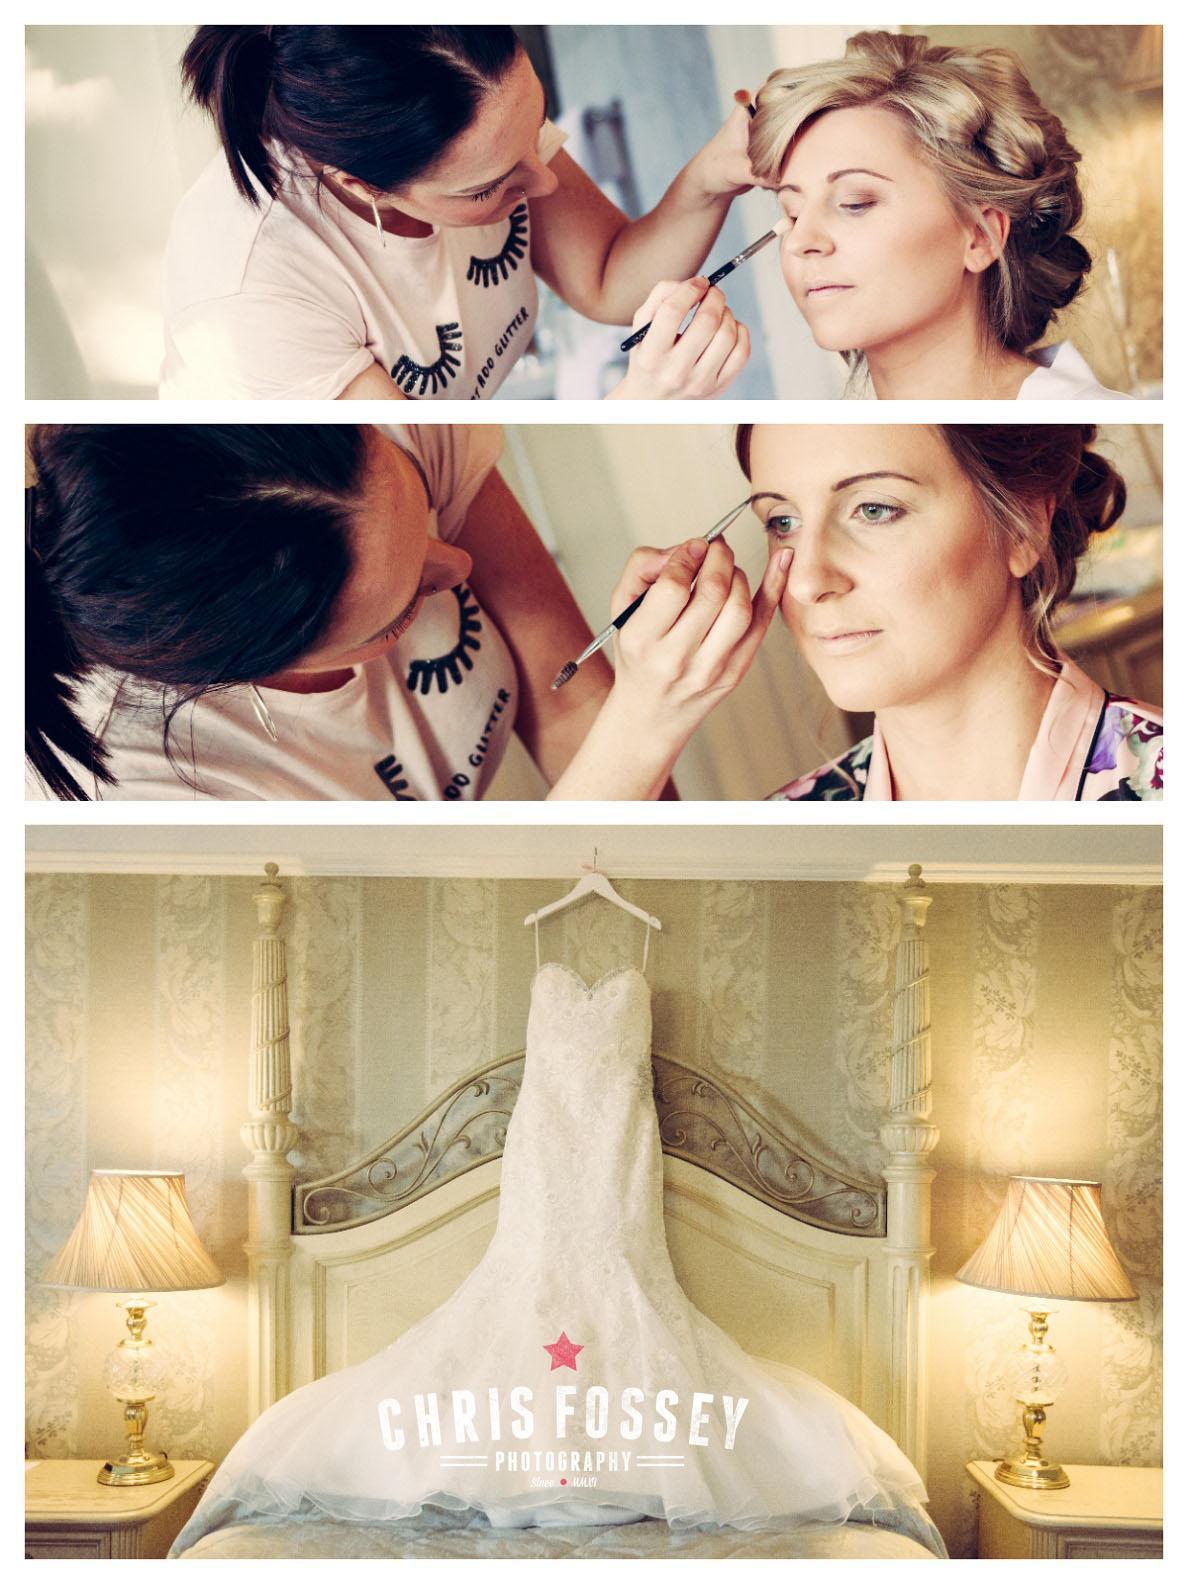 Nuthurst Grange Hotel Gorgeous Natural Wedding Photography Warwickshire Chris Fossey B94 5NL 02